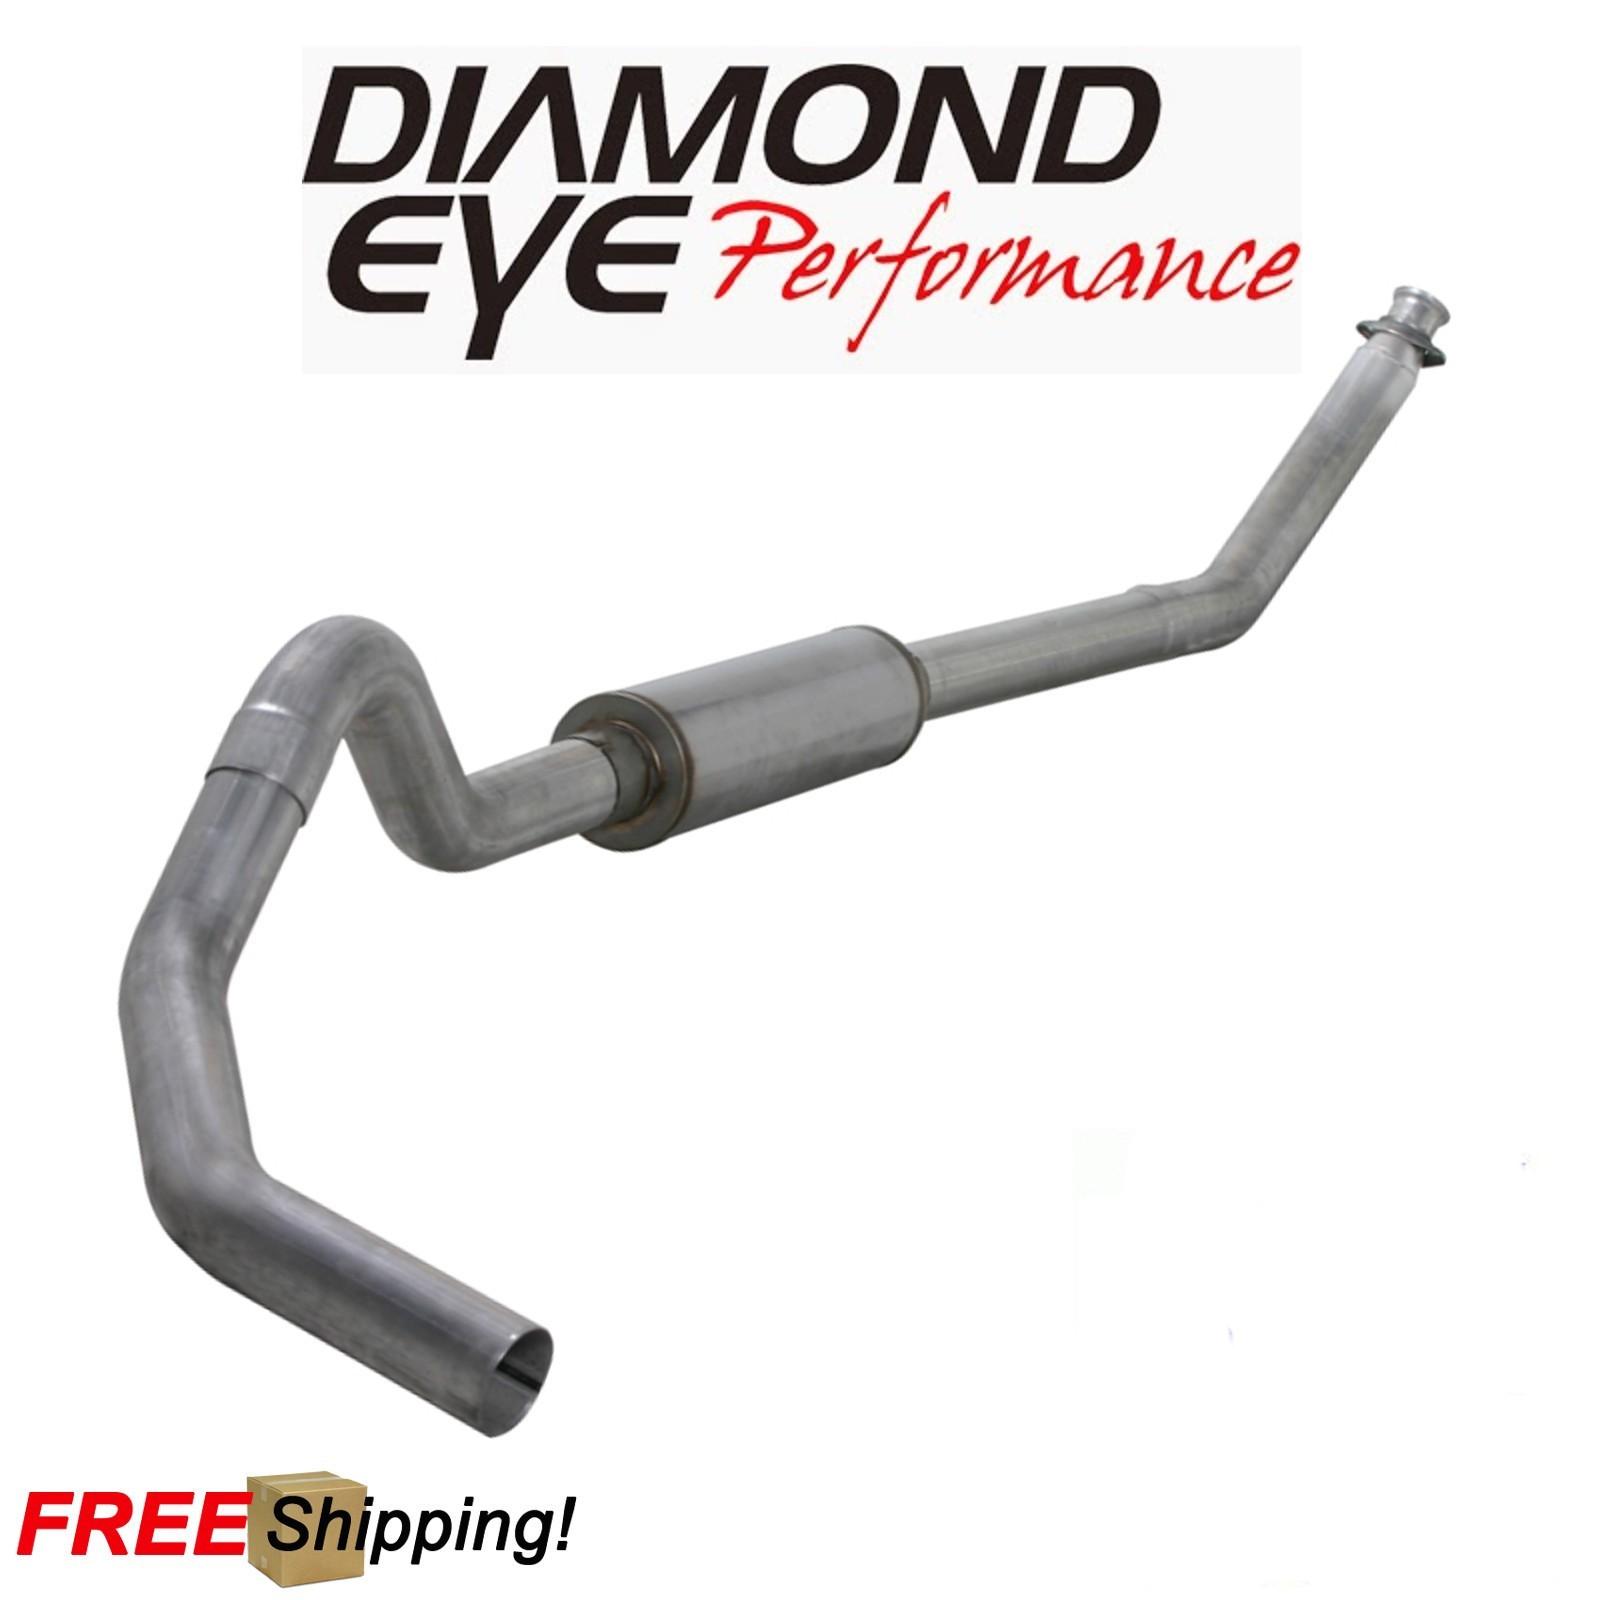 Details about Diamond Eye 4 Inch Turbo Back Exhaust For 94-98 Dodge Ram  5 9L Diesel W/ Muffler